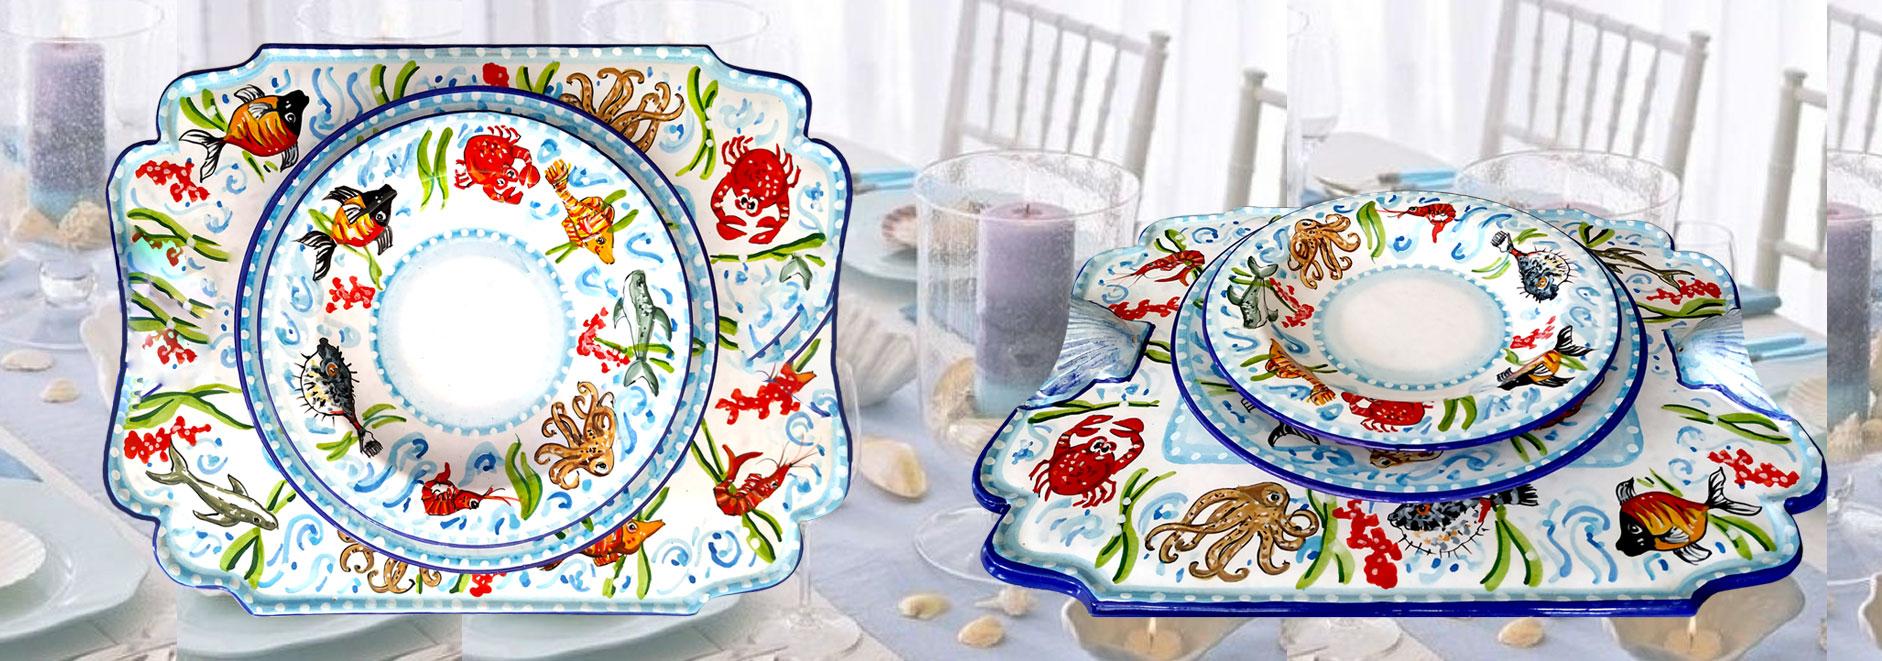 Deruta-tavola-siciliano-ceramics.jpg